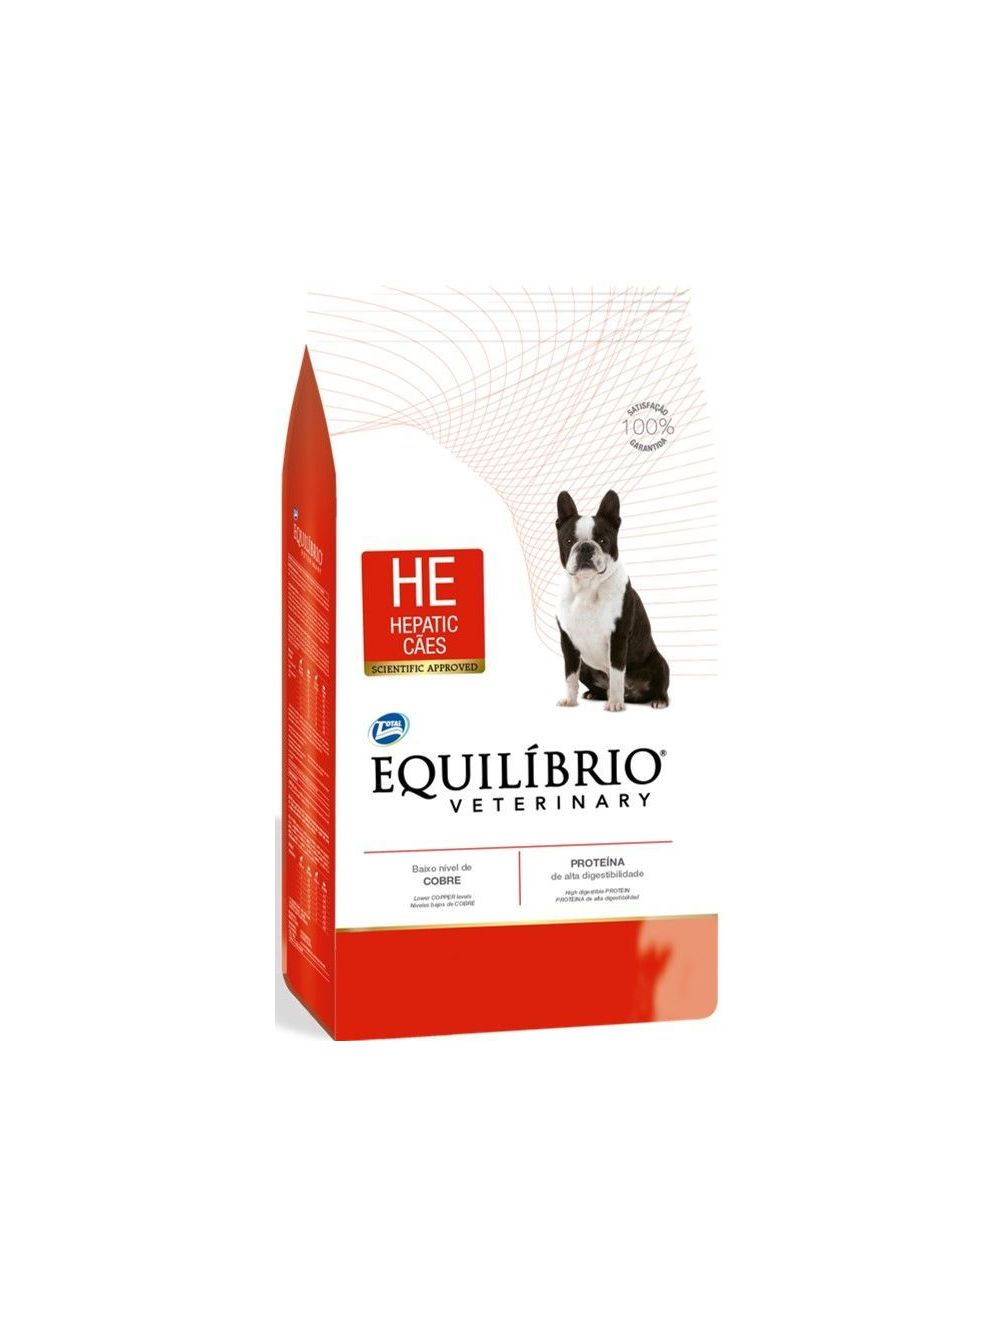 Equilibrio Perro Veterinary Hepatic x 2Kg - P80